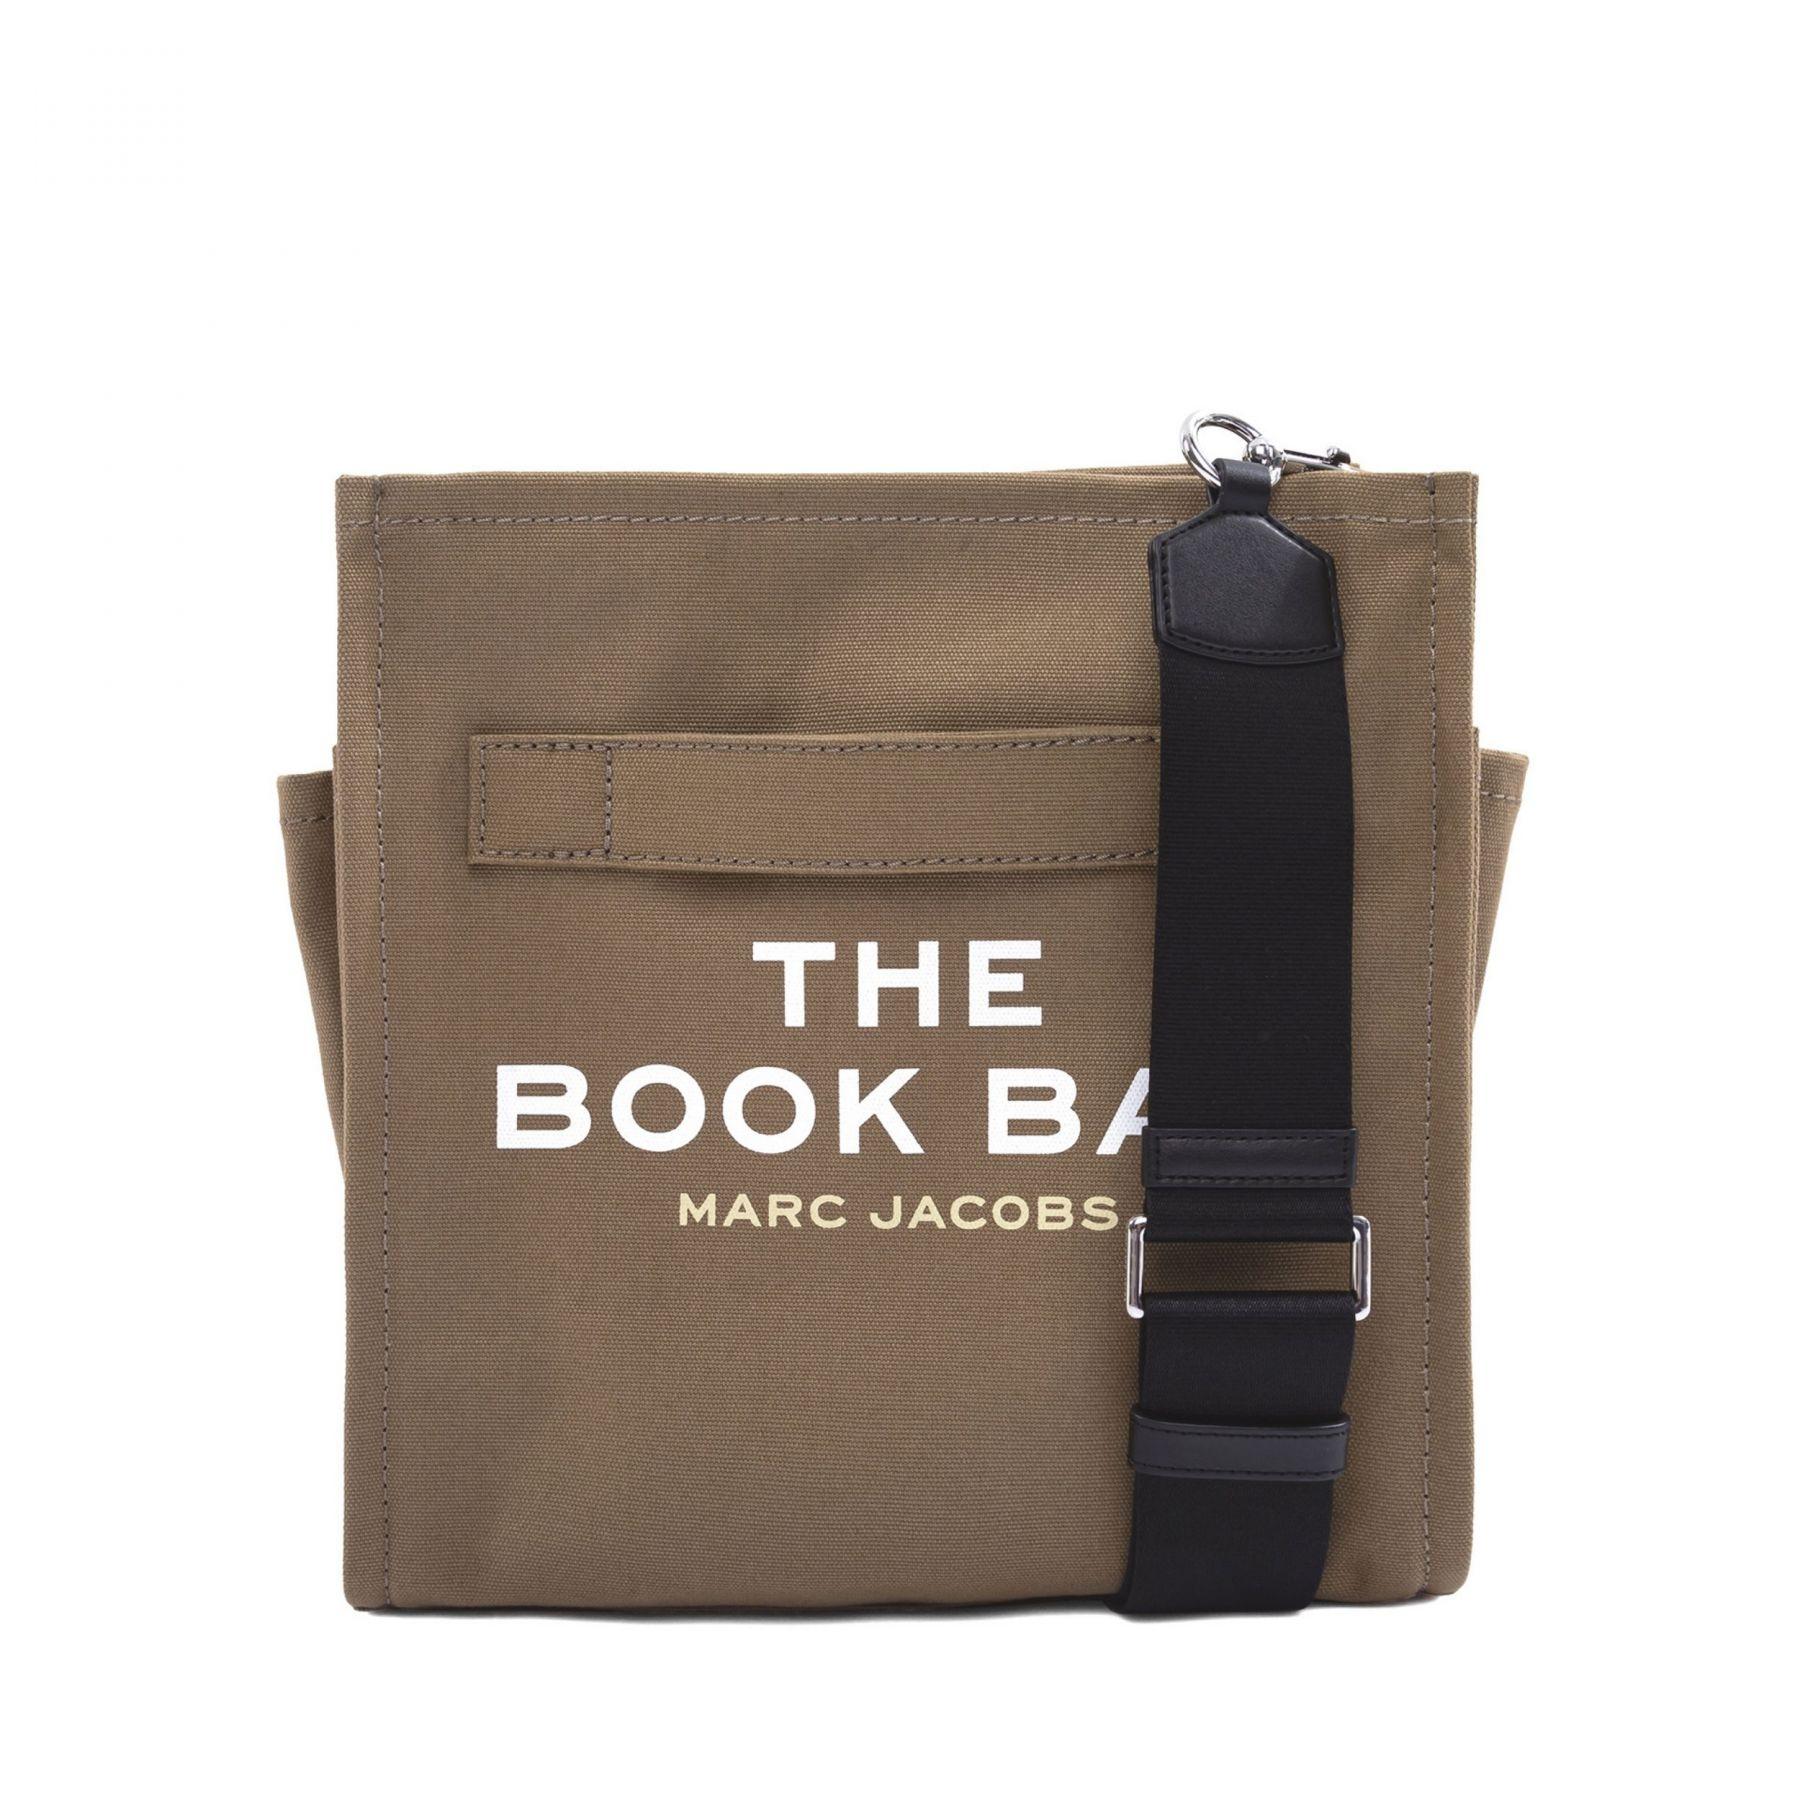 Сумка Marc Jacobs The Book Bag коричневая